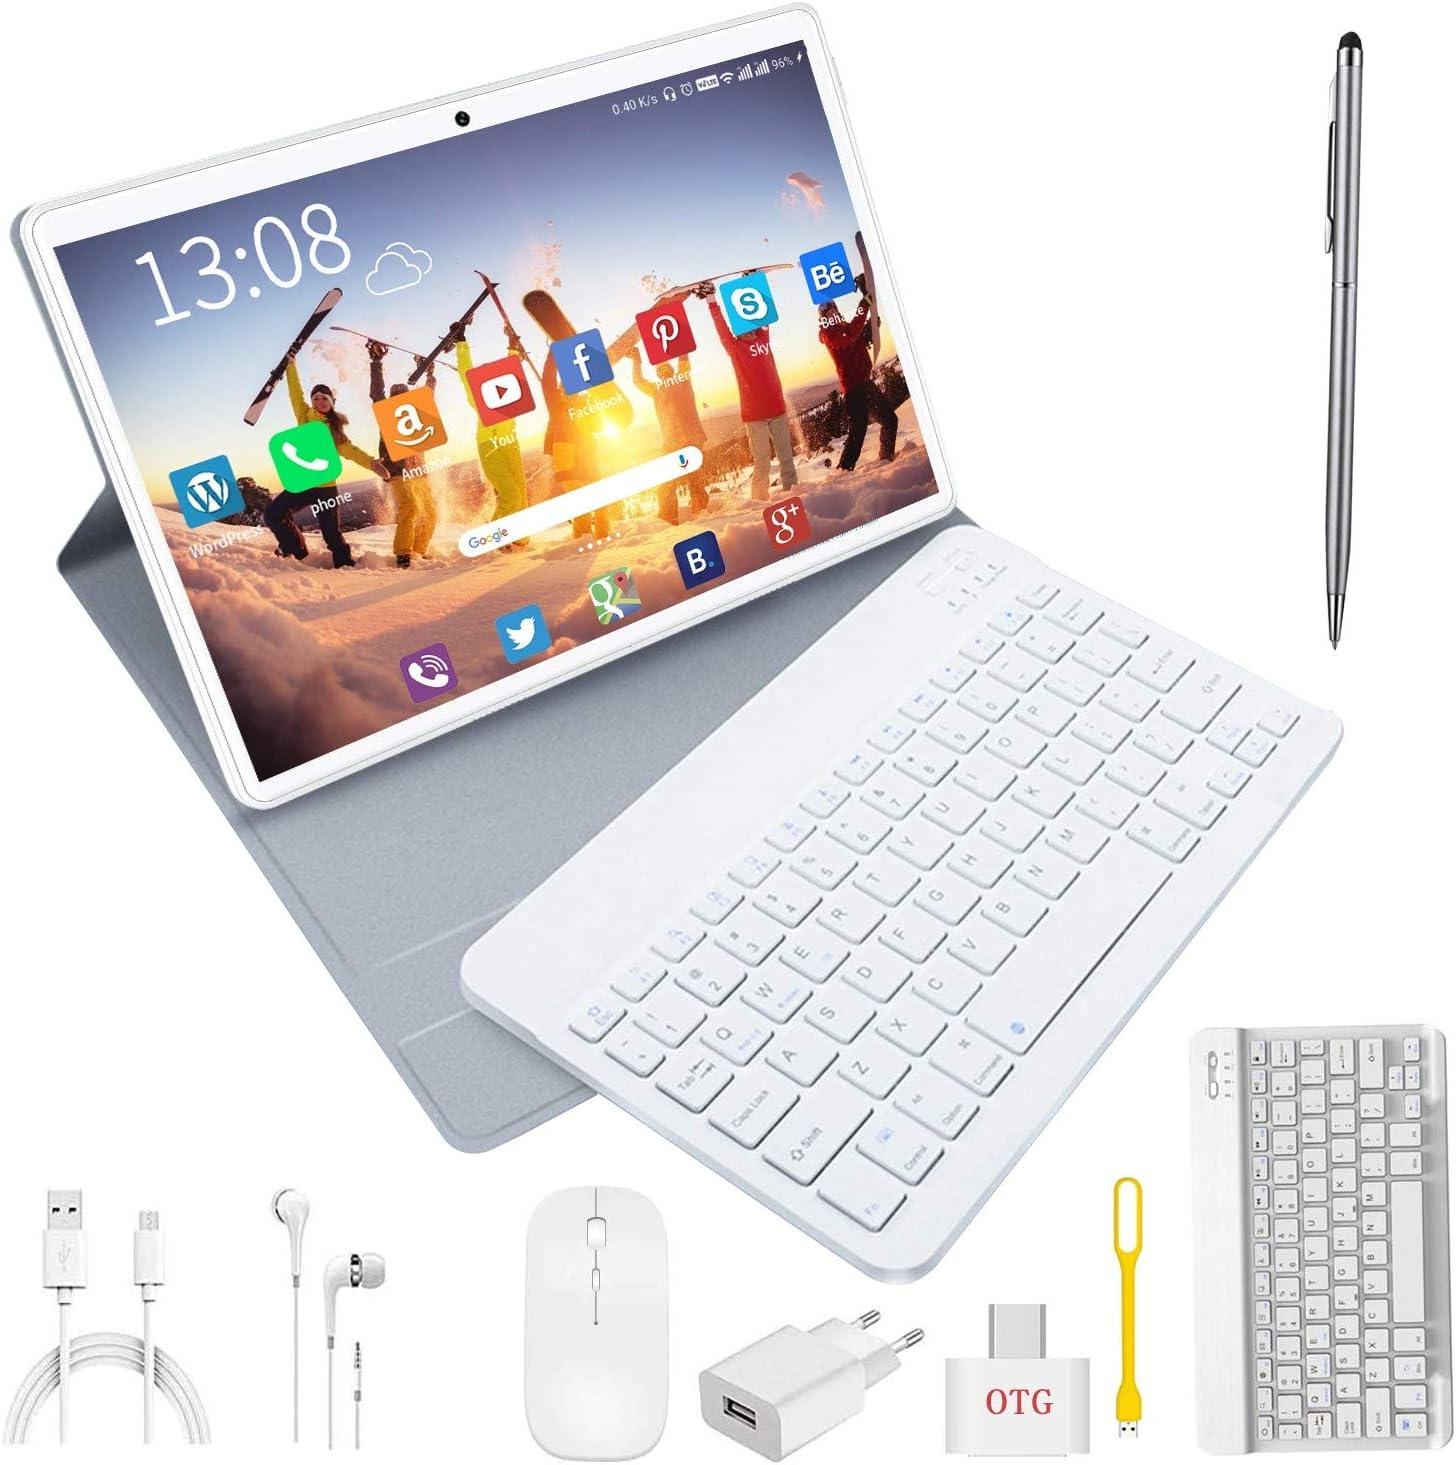 Tablet 10 Pulgadas 4G/wifi Android 9.0 Pie Ultrar-Rápido Tablets 4GB RAM + 64GB ROM/256GB Escalable | Laptop convertible de oficina | Dual SIM - 8000mA Bluetooth GPS Type-C Tablet (5+8.0MP Cámara) Oro